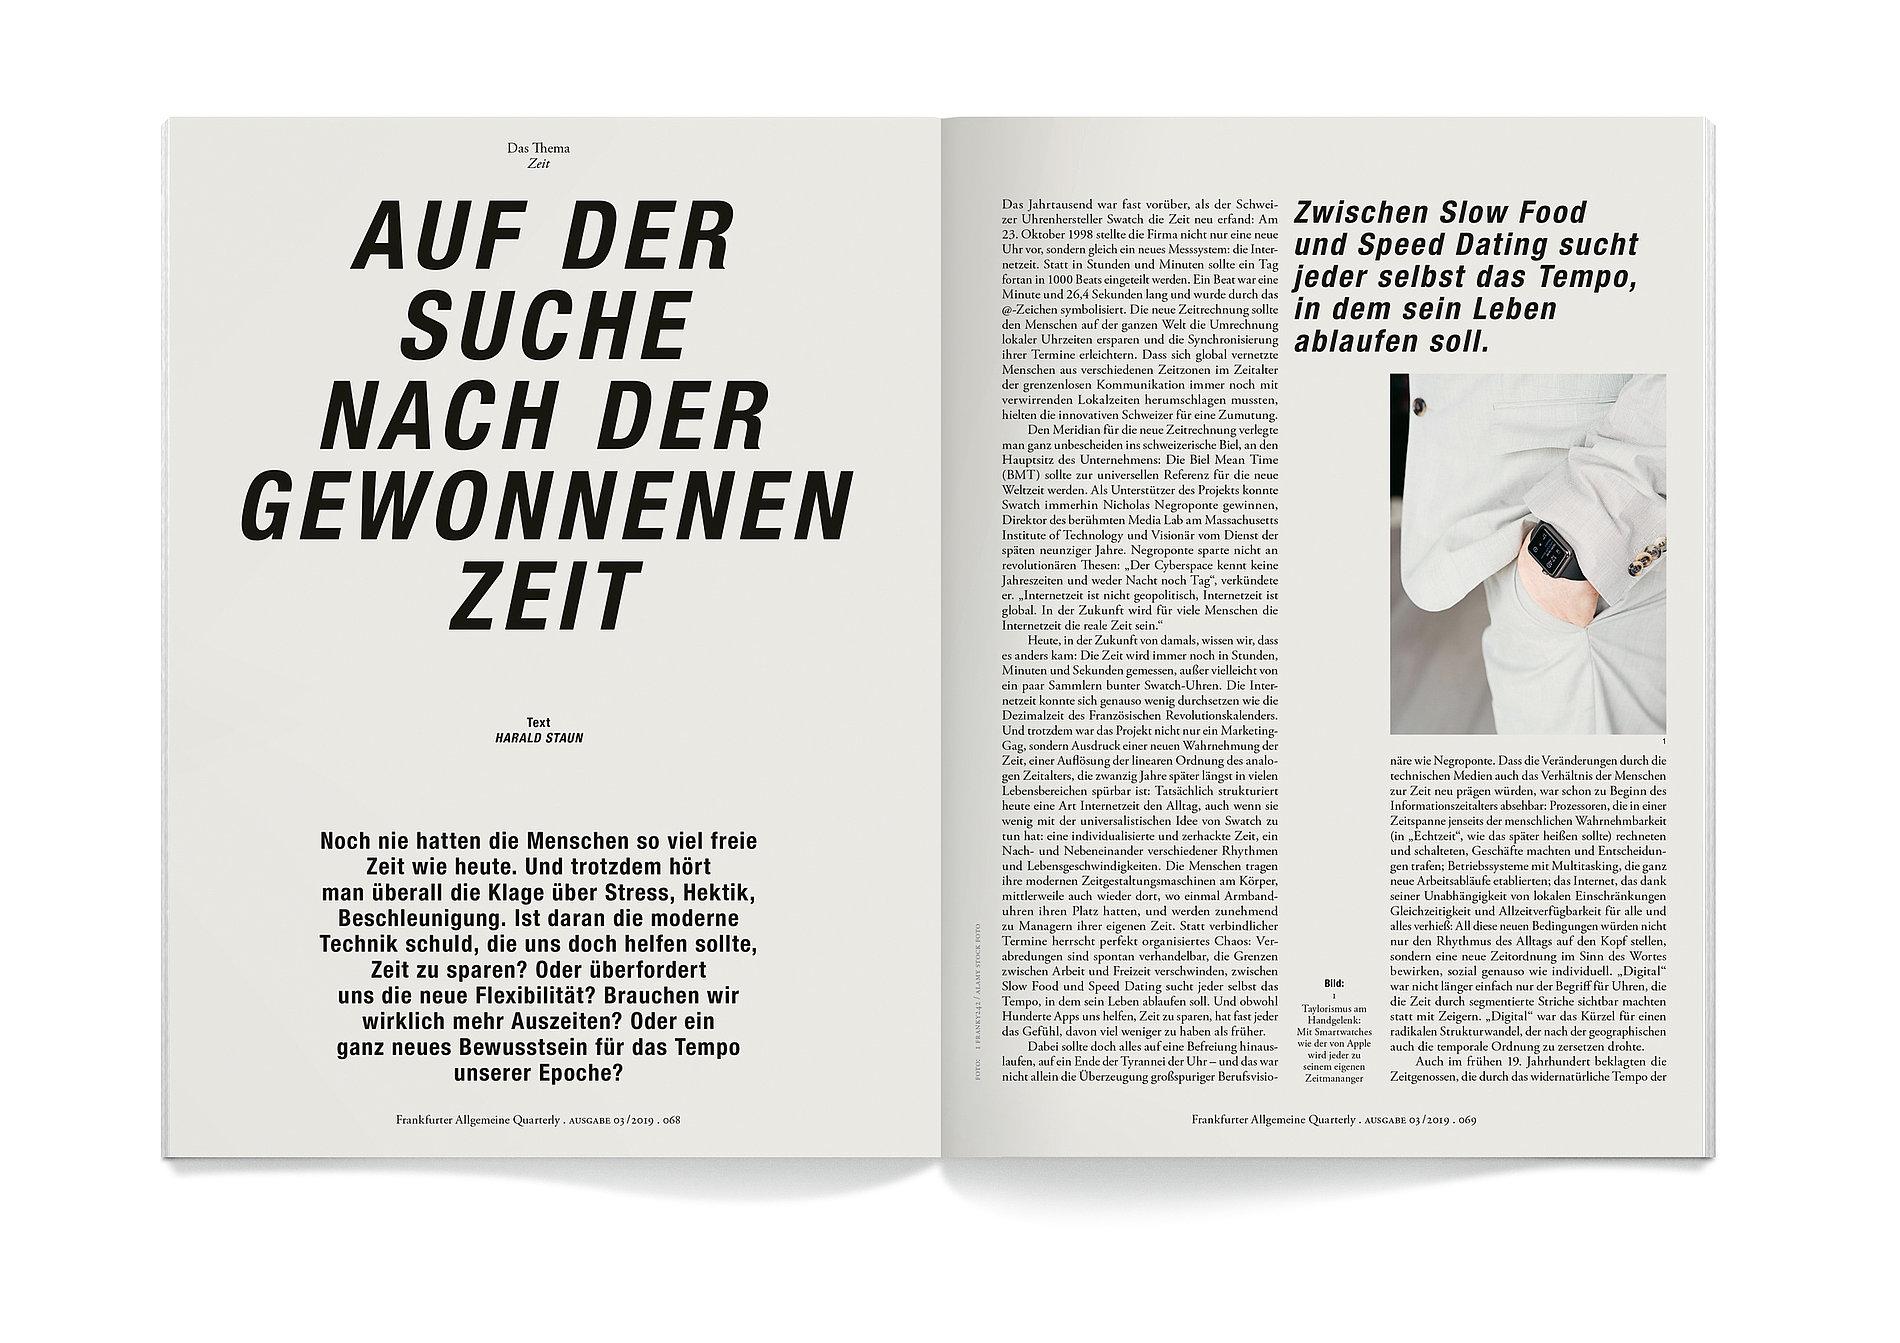 Frankfurter Allgemeine Quarterly | Red Dot Design Award